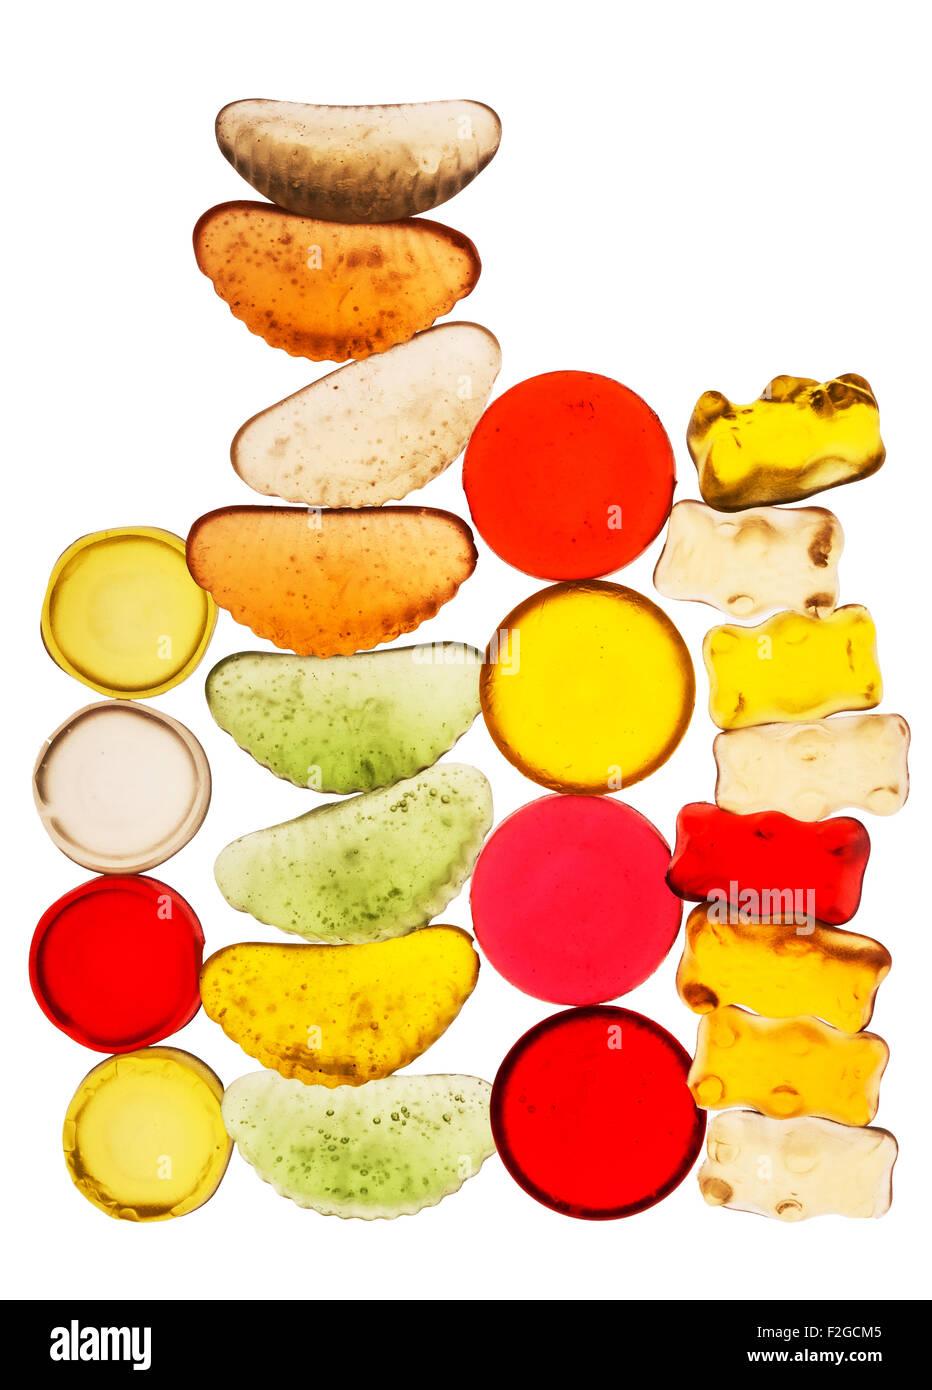 Vivacemente colorato traslucido caramelle impilate in quattro torri verticali Immagini Stock